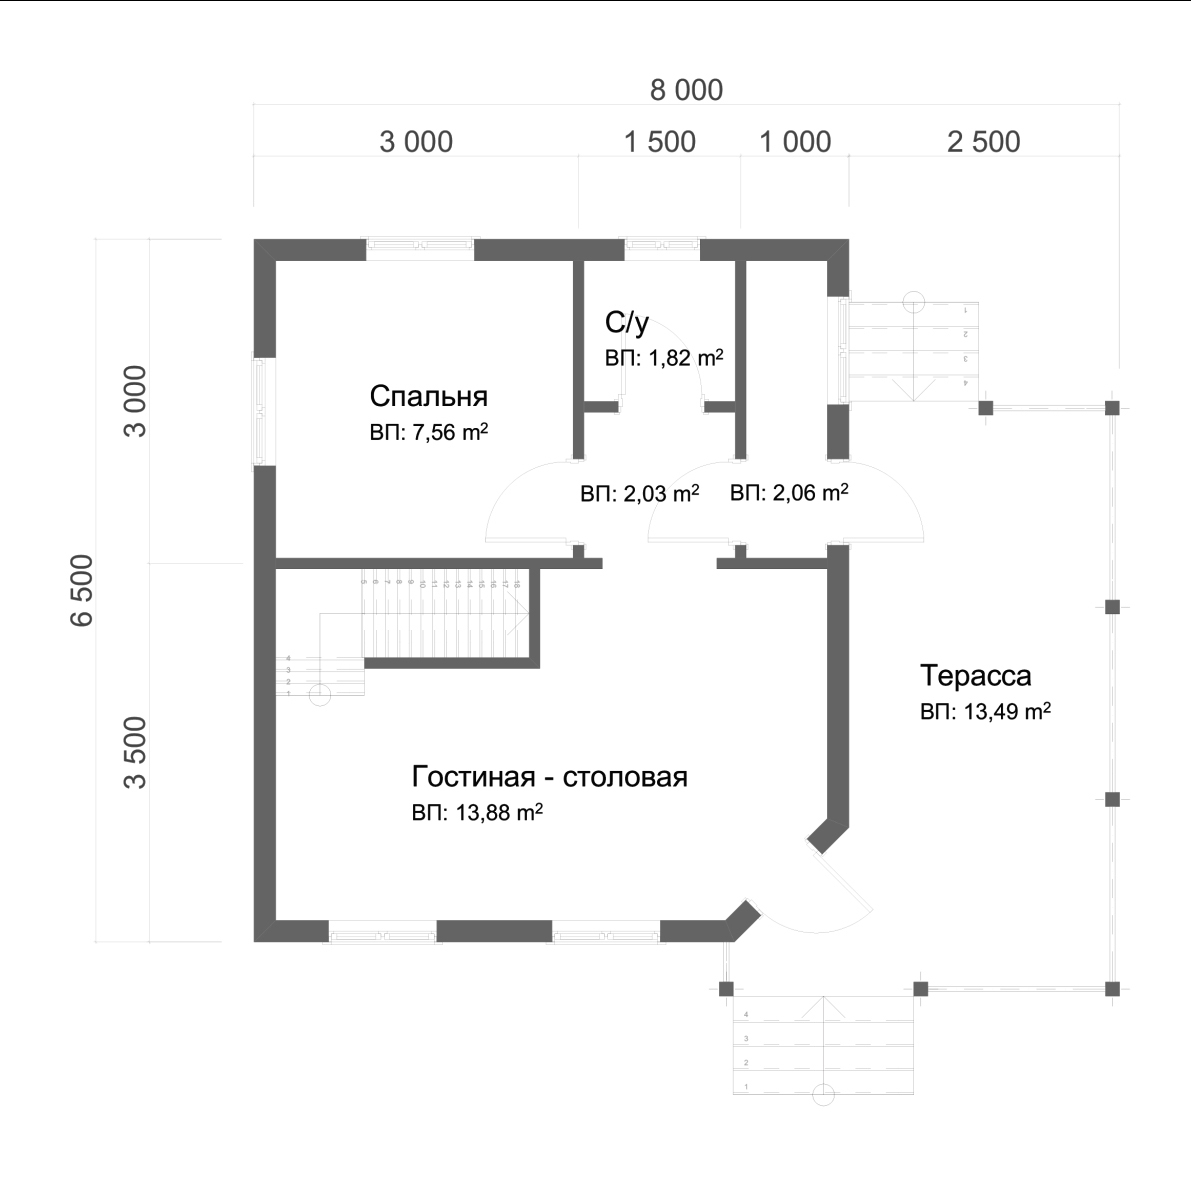 Проект дома из бруса 6,7х8 с мансардой. План 1-го этажа.